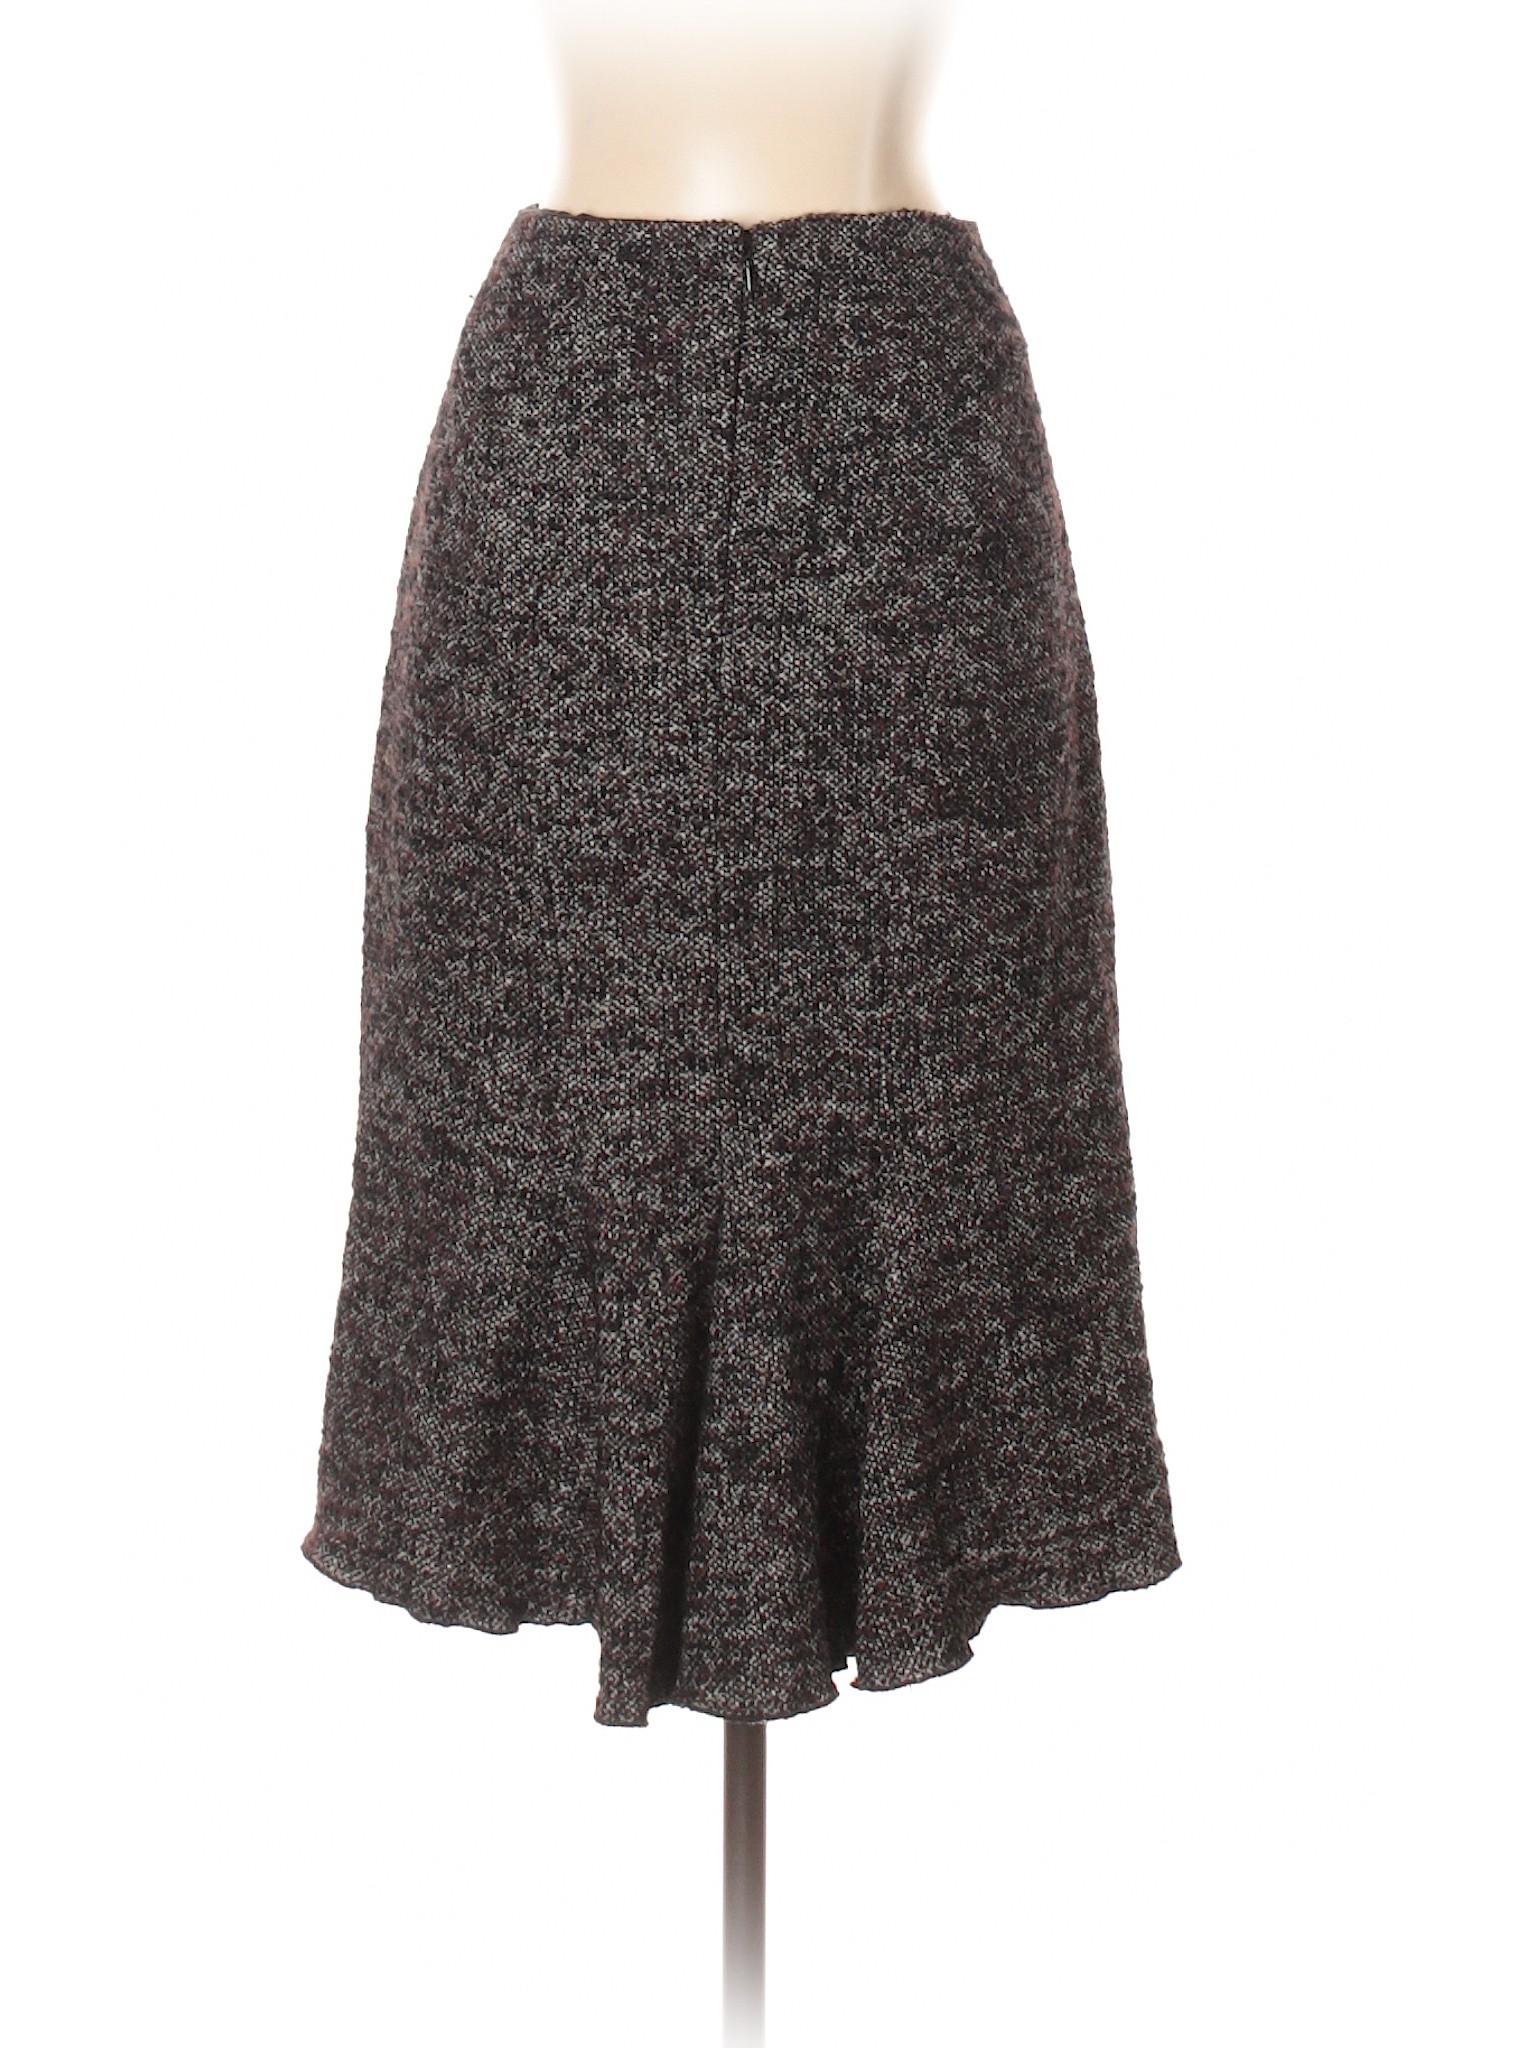 Boutique Skirt Boutique BCBGMAXAZRIA Wool BCBGMAXAZRIA xqzYFdWq